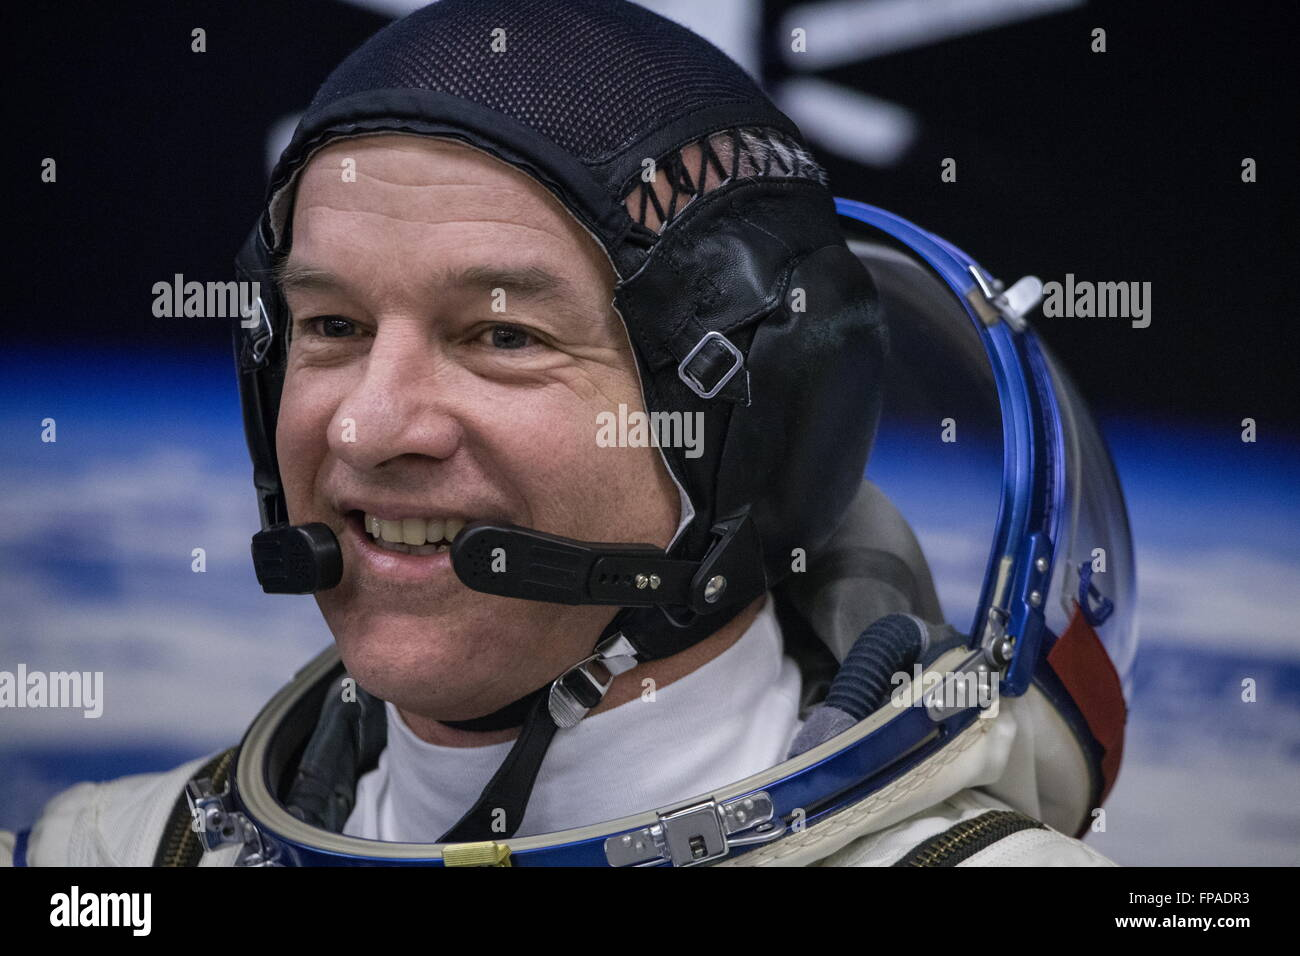 Baikonur, Kazakhstan. 18th Mar, 2016. Crew member of Expedition 47/48, NASA astronaut Jeffrey Jeff Williams looks - Stock Image